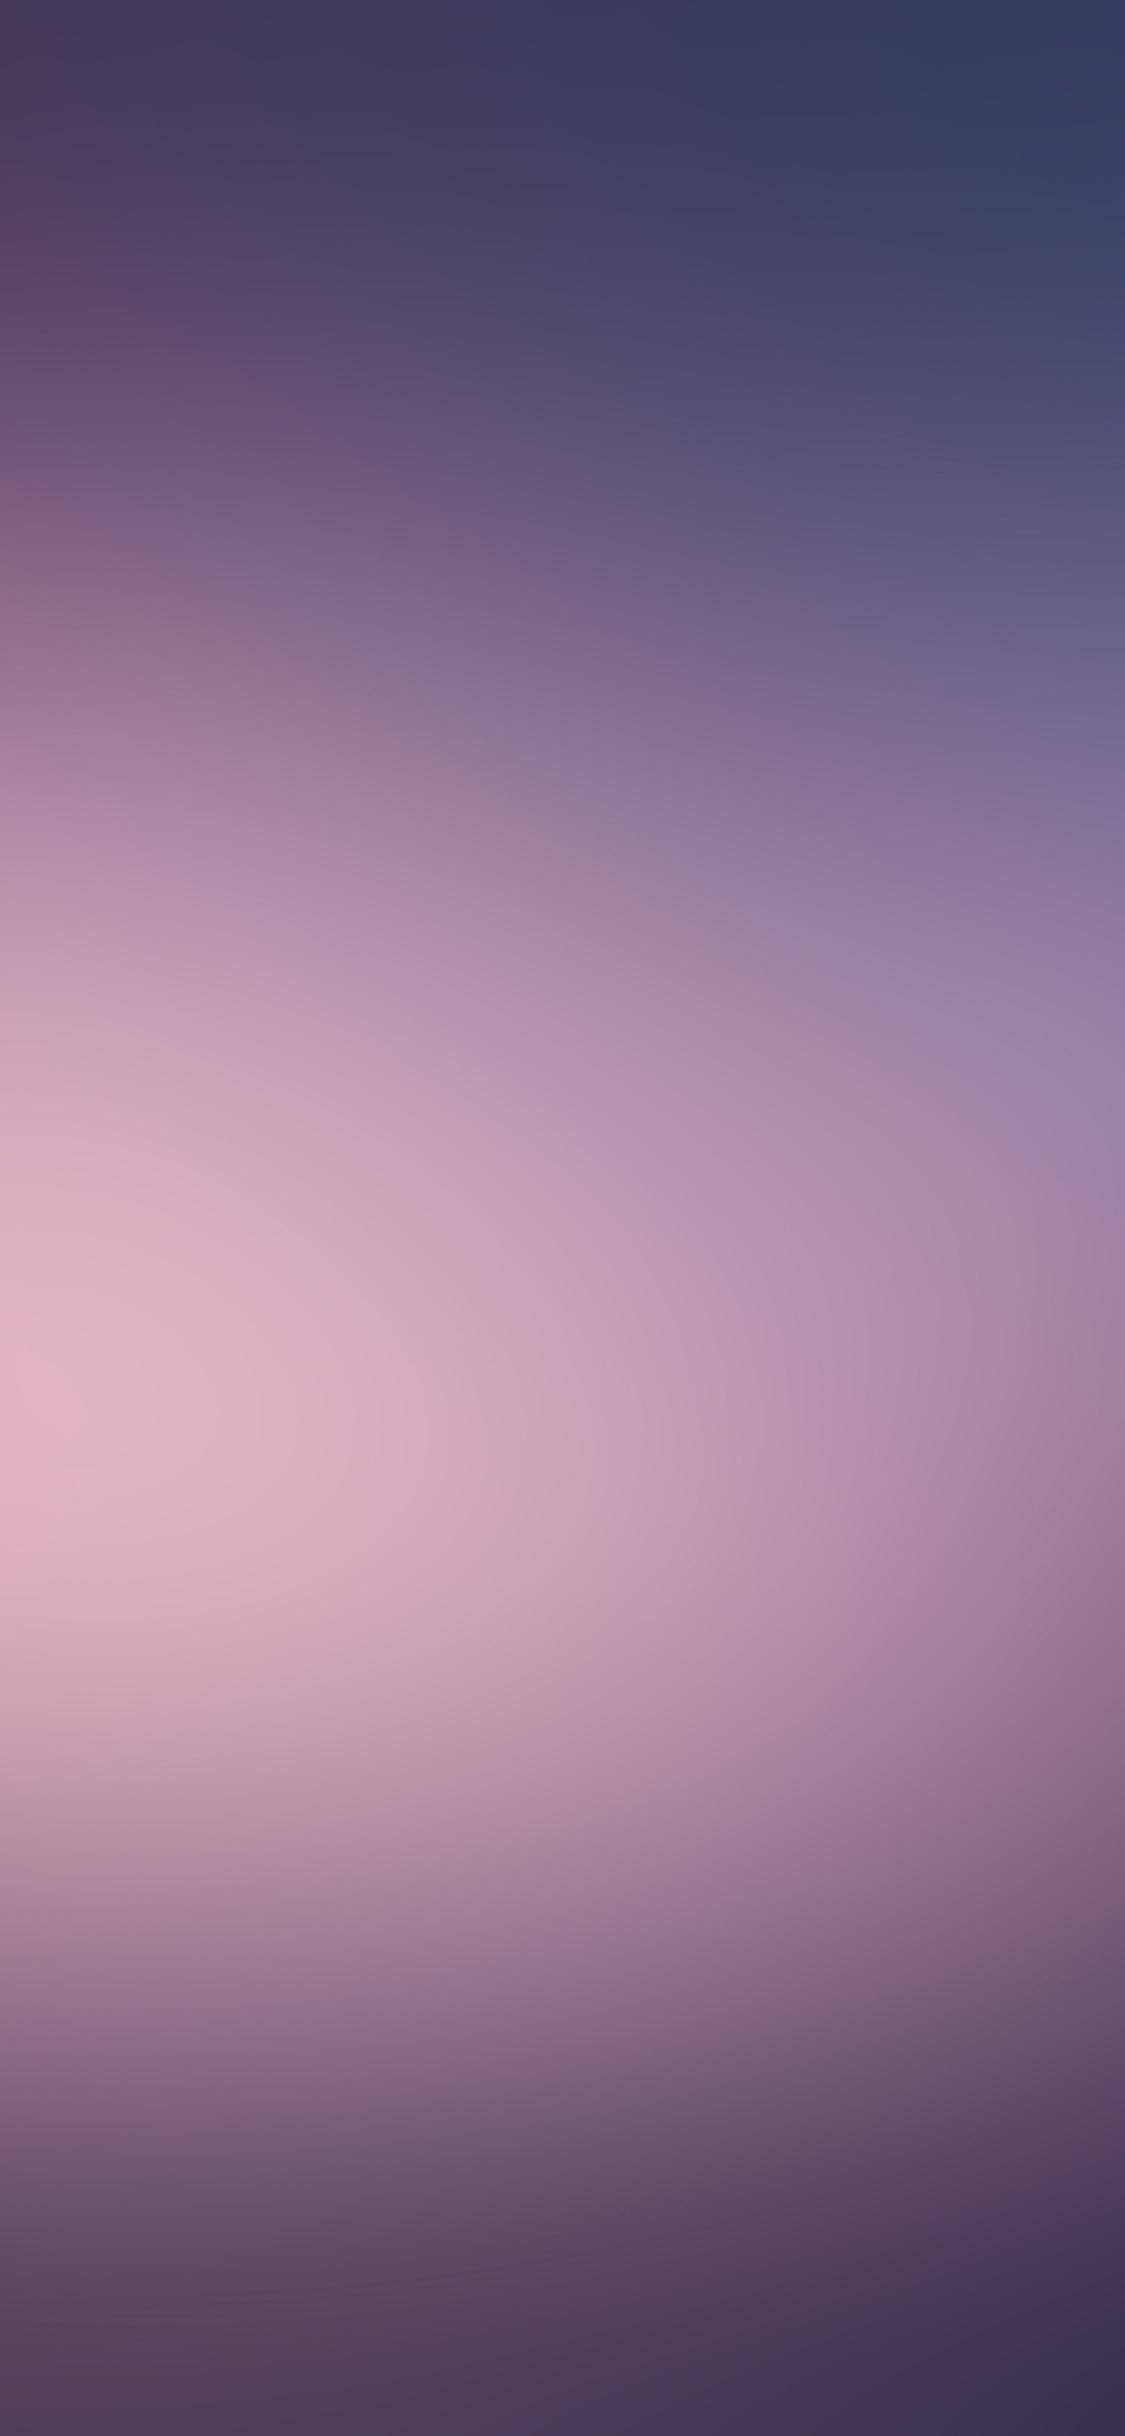 iPhoneXpapers.com-Apple-iPhone-wallpaper-sb35-wallpaper-beauty-pond-blur